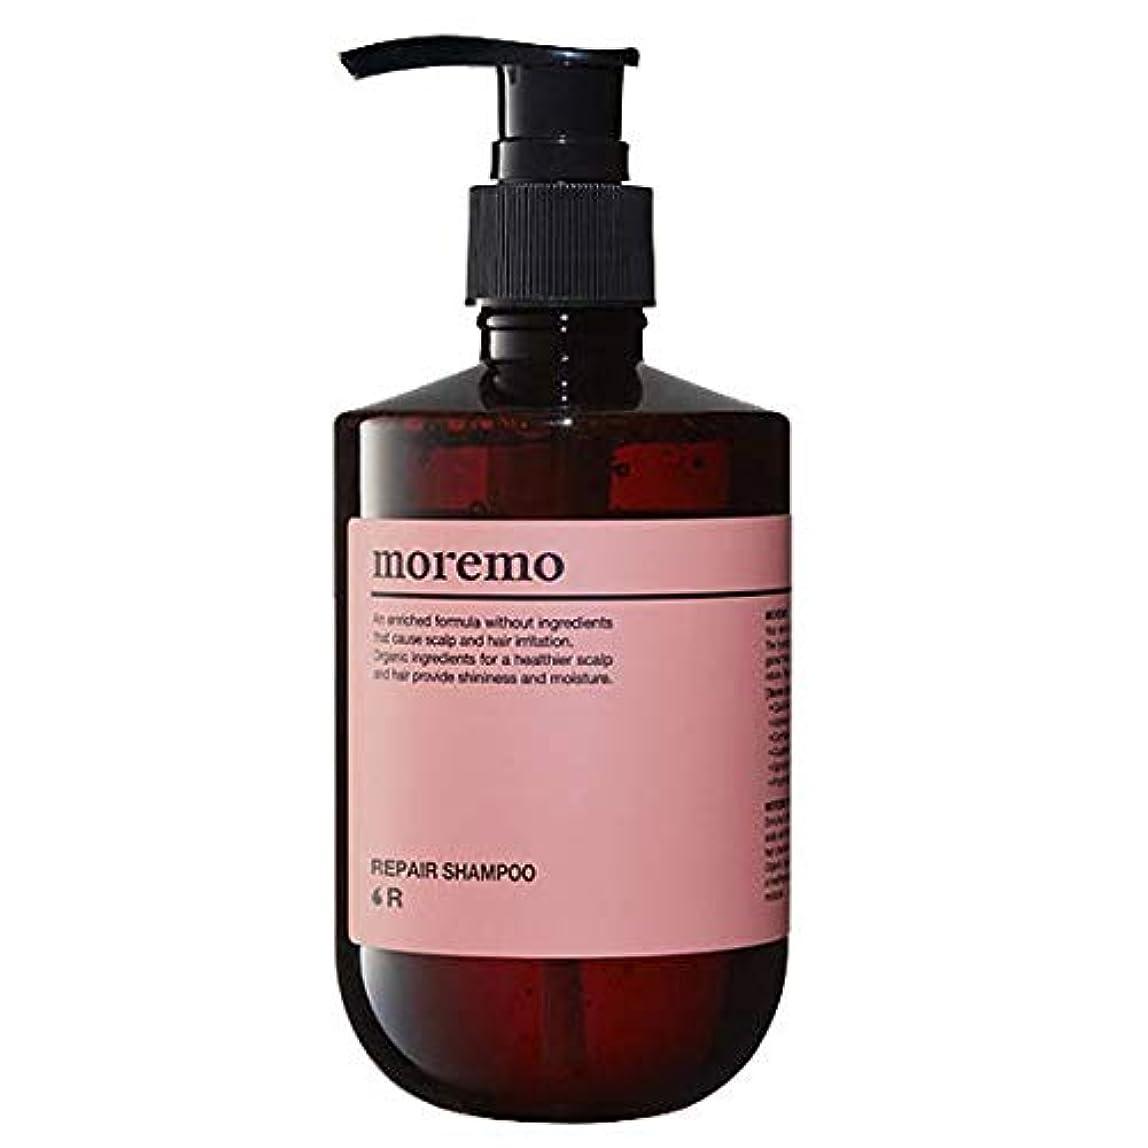 Moremo Repair Shampoo モレモ リペア シャンプー R 300ml [並行輸入品]